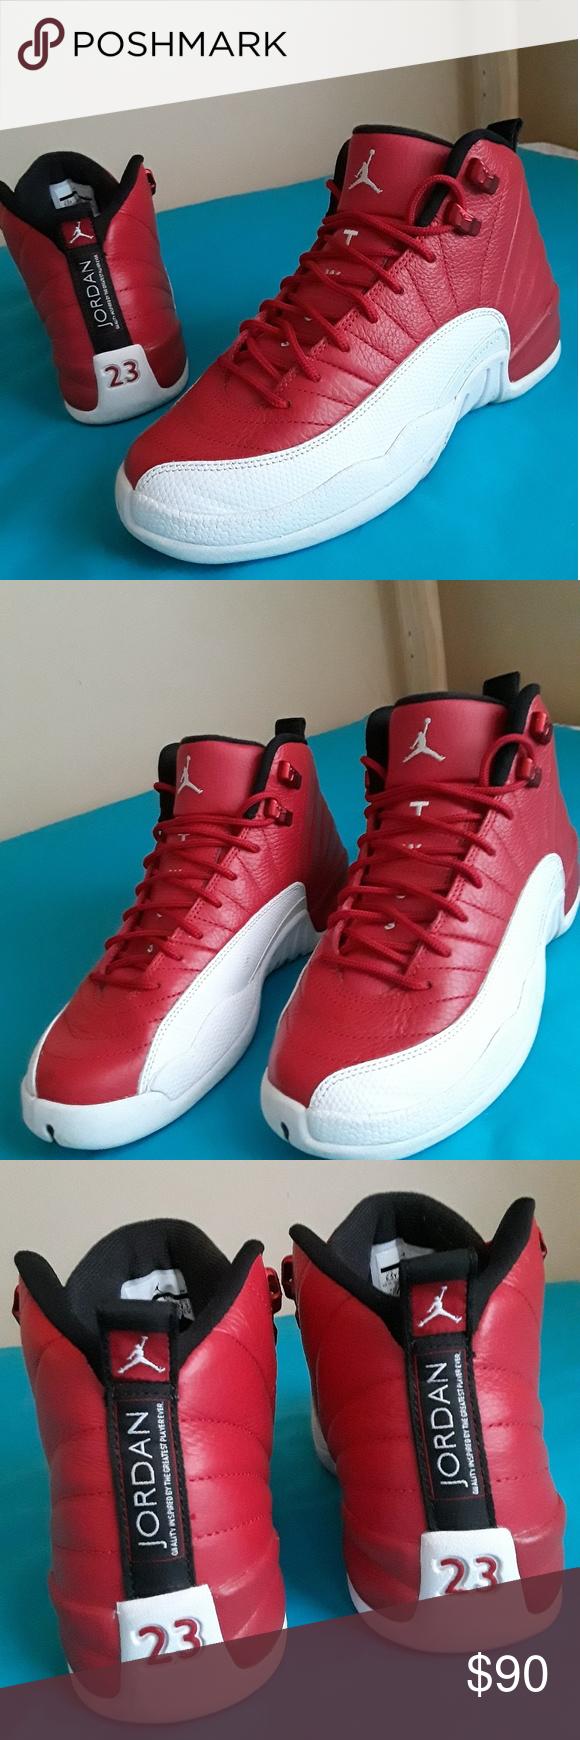 Nike Air Jordan 12 Retro Gym Red Wht